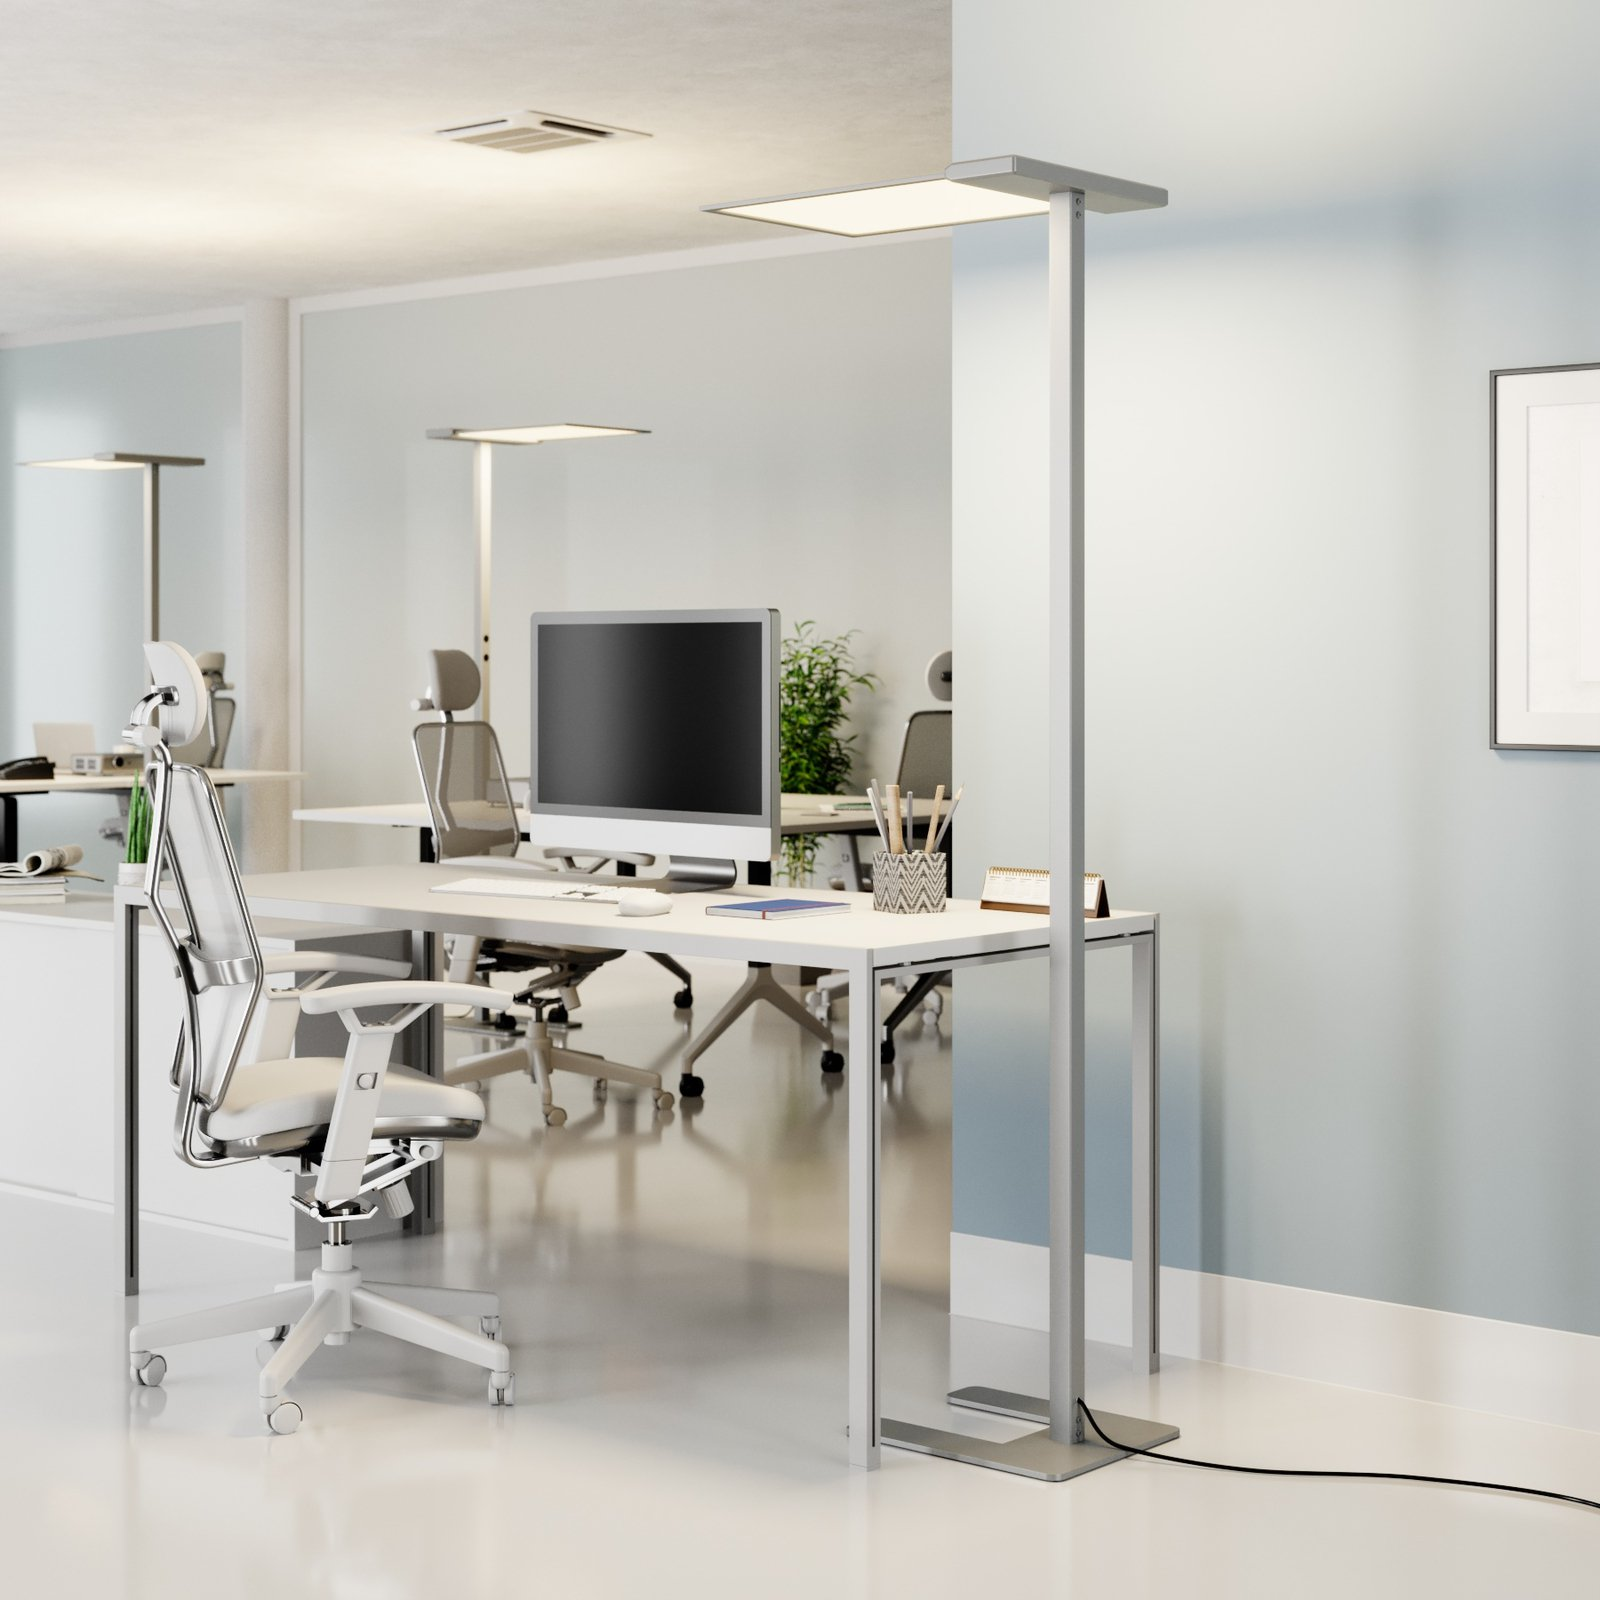 LED-office-gulvlampe Esmael 36W + 20W dimmer'